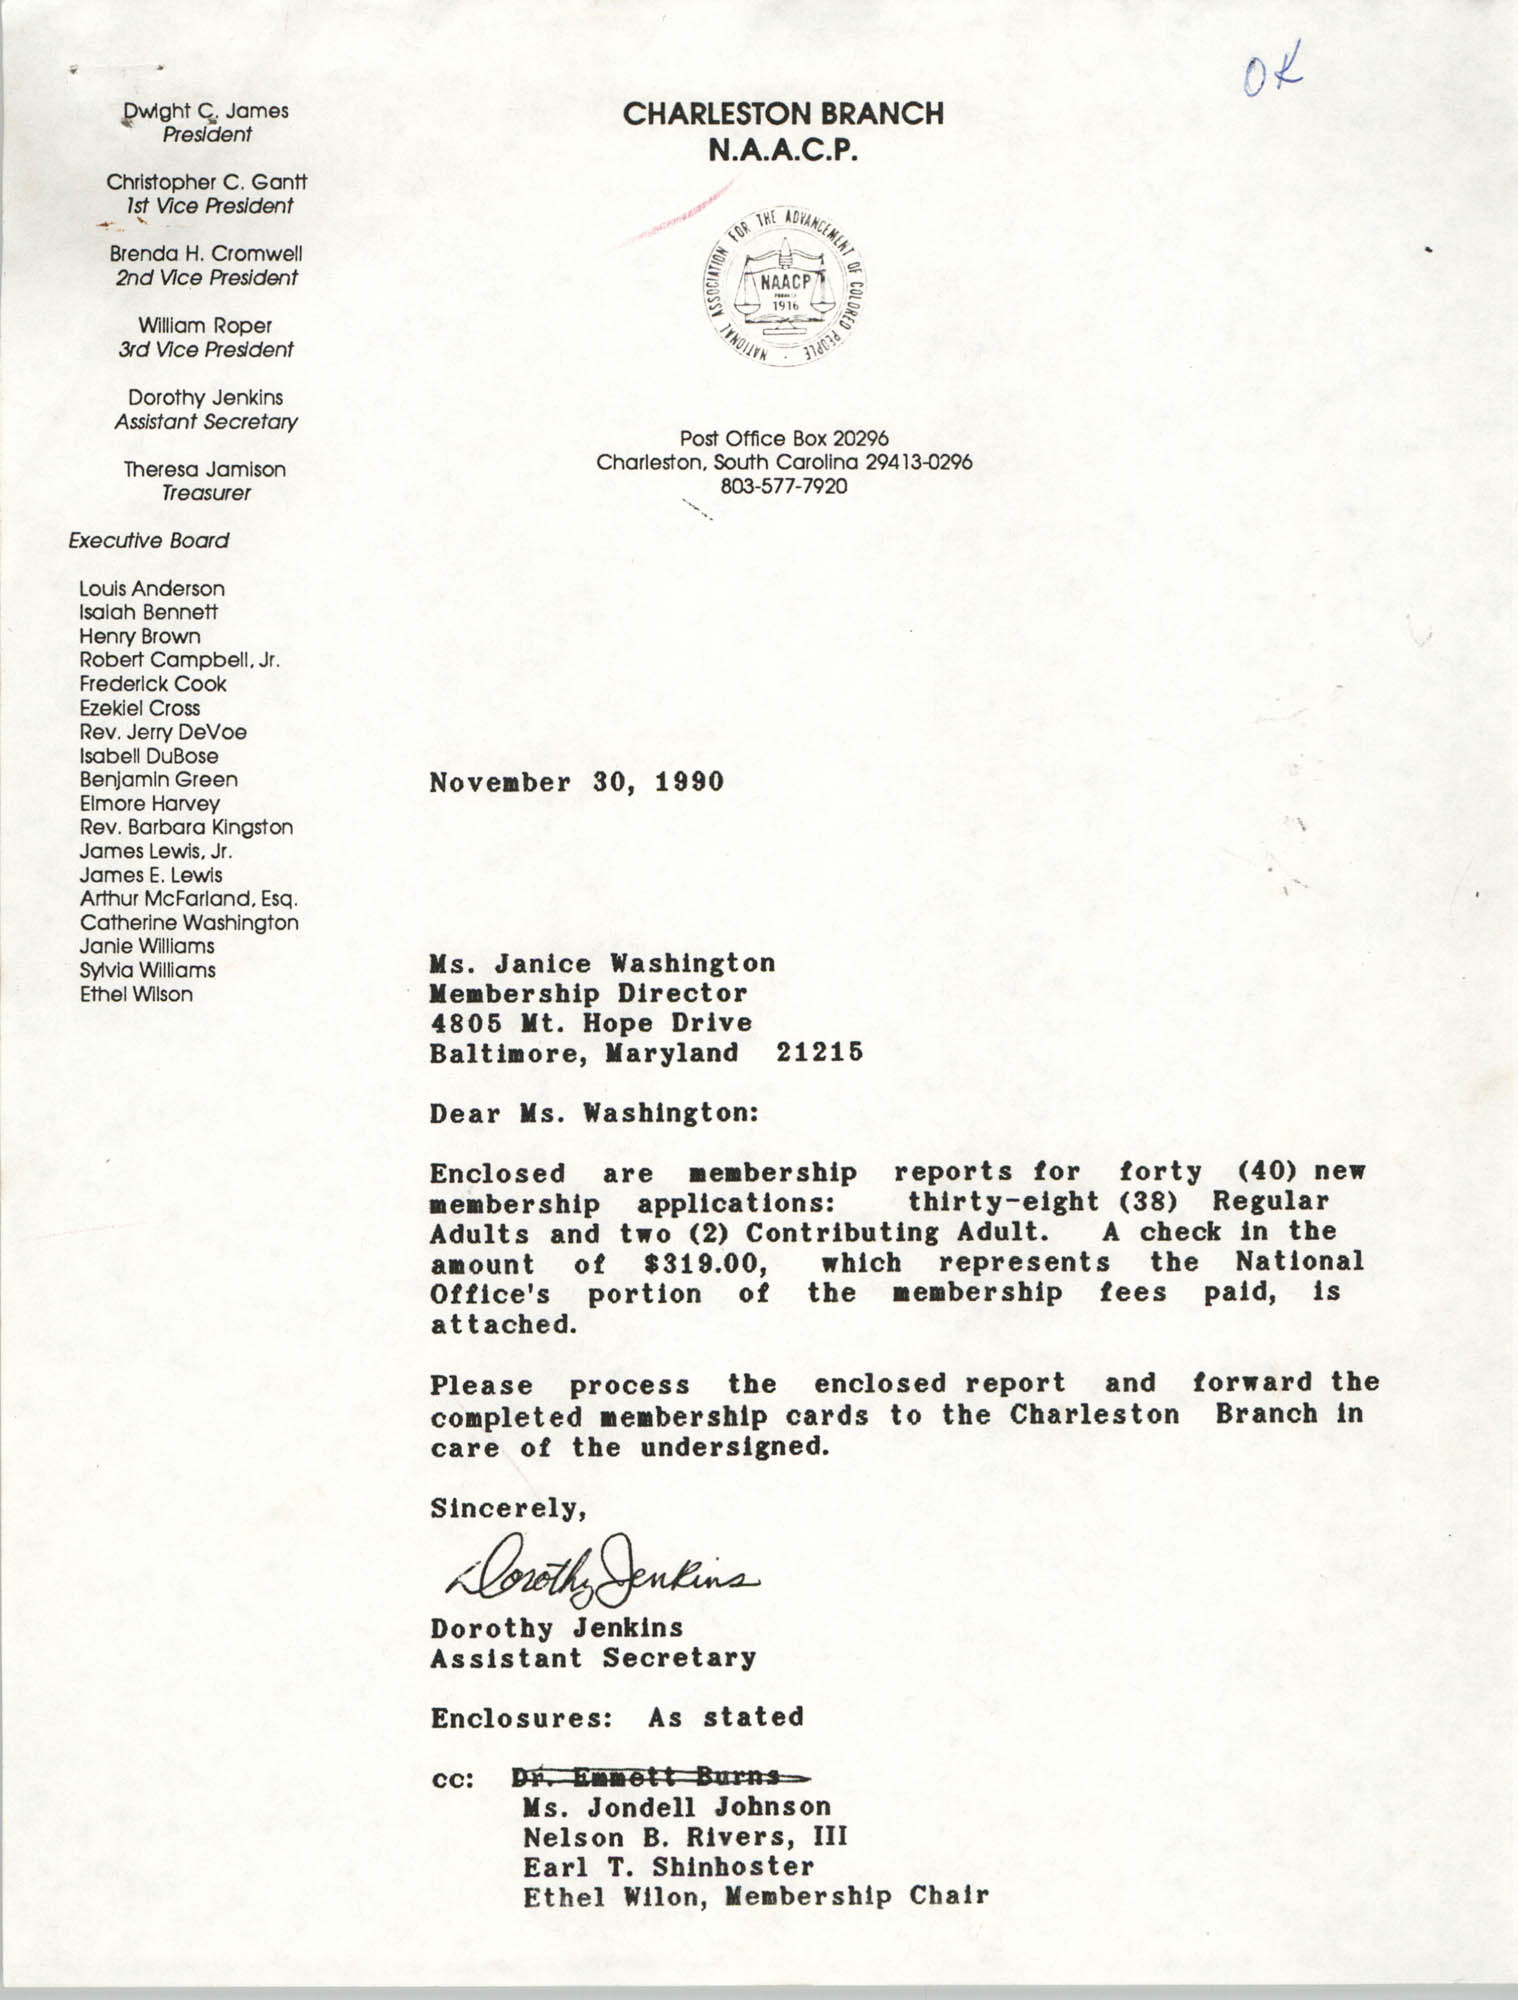 Letter from Dorothy Jenkins to Janice Washington, NAACP, November 30, 1990